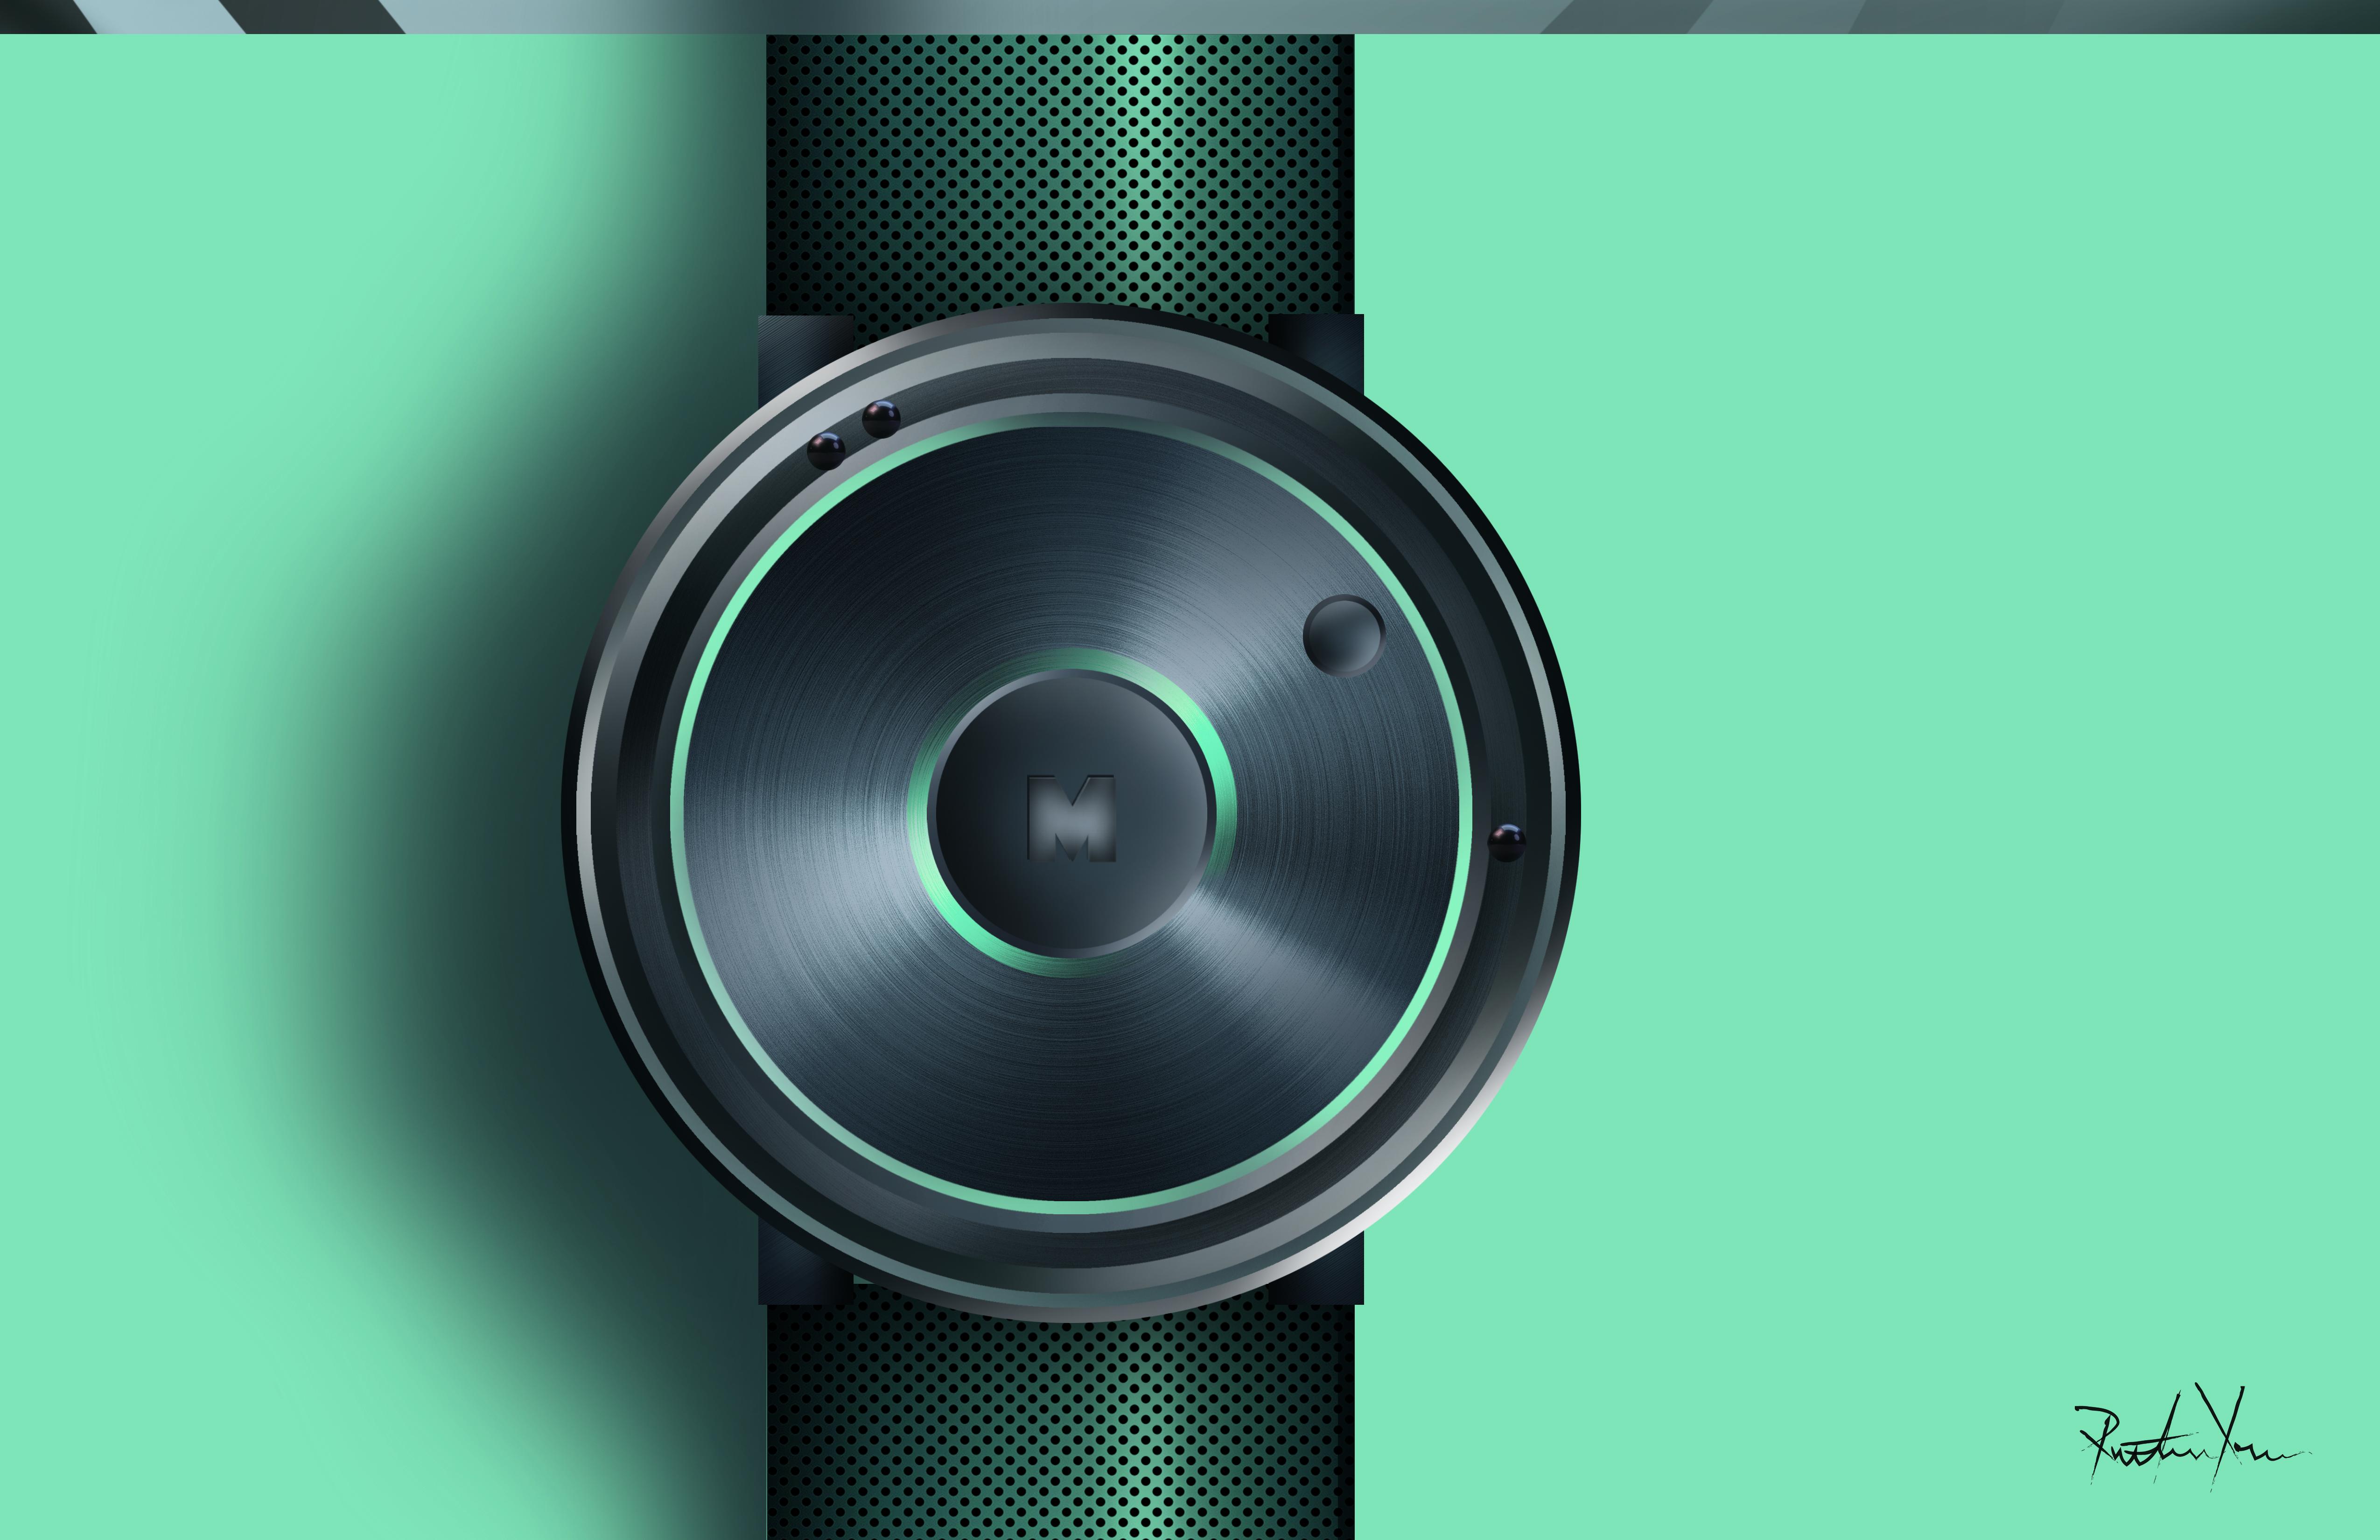 Watch - Concept